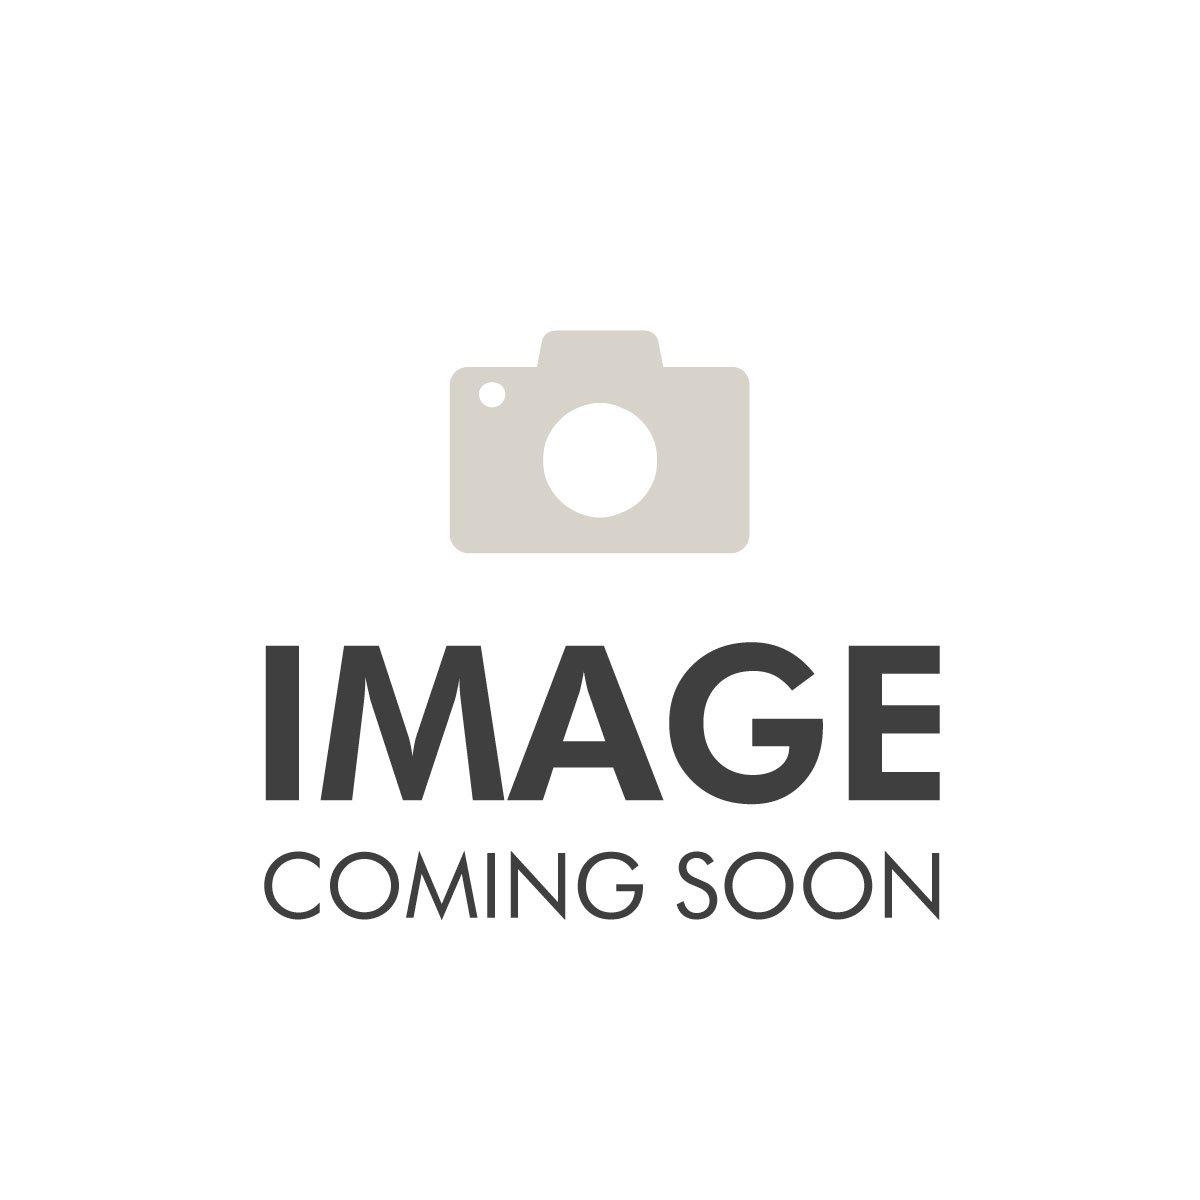 Gianfranco Ferre Ferre Rose Princesse 30ml EDT Spray